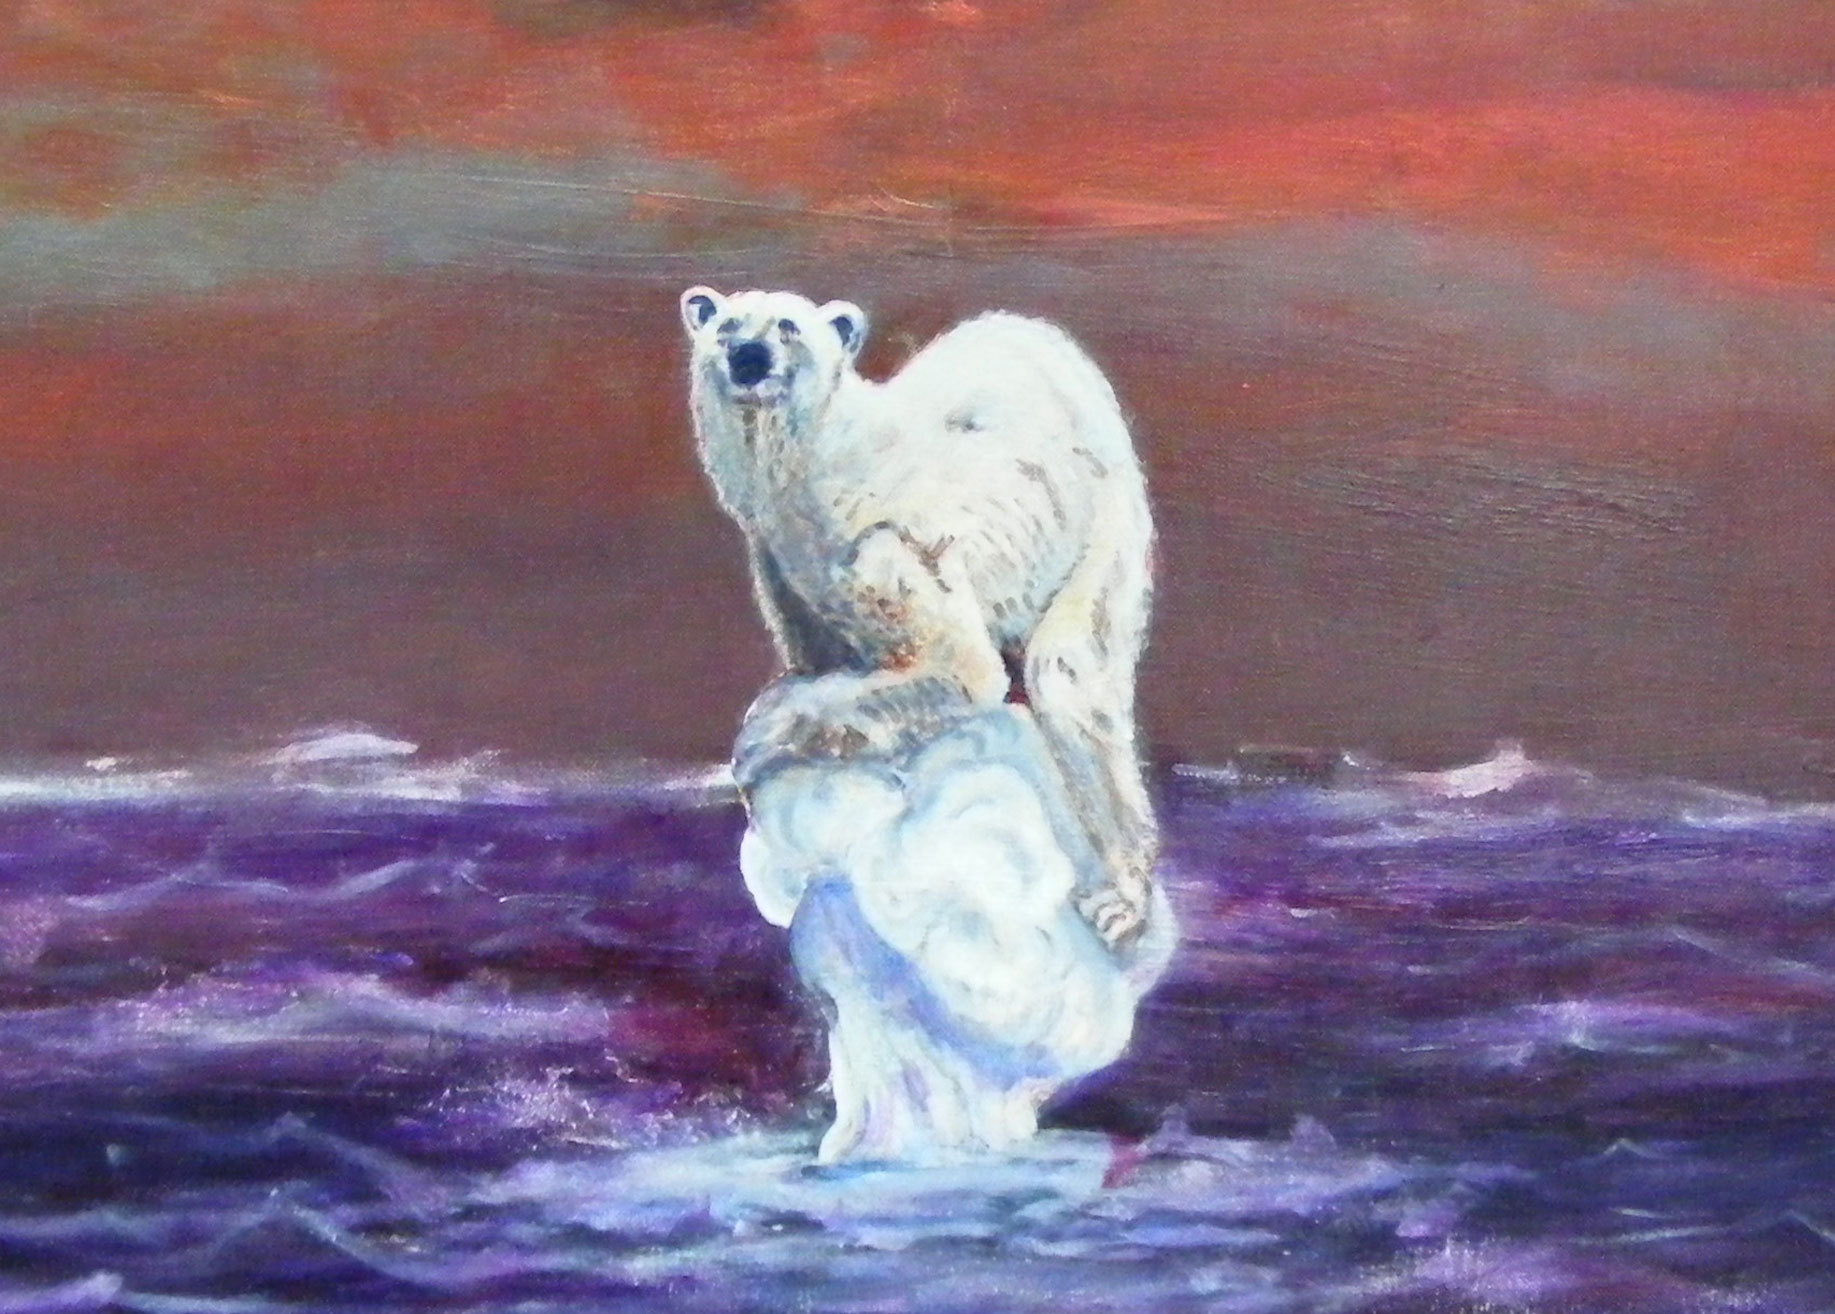 Last Voyage of the polar bear